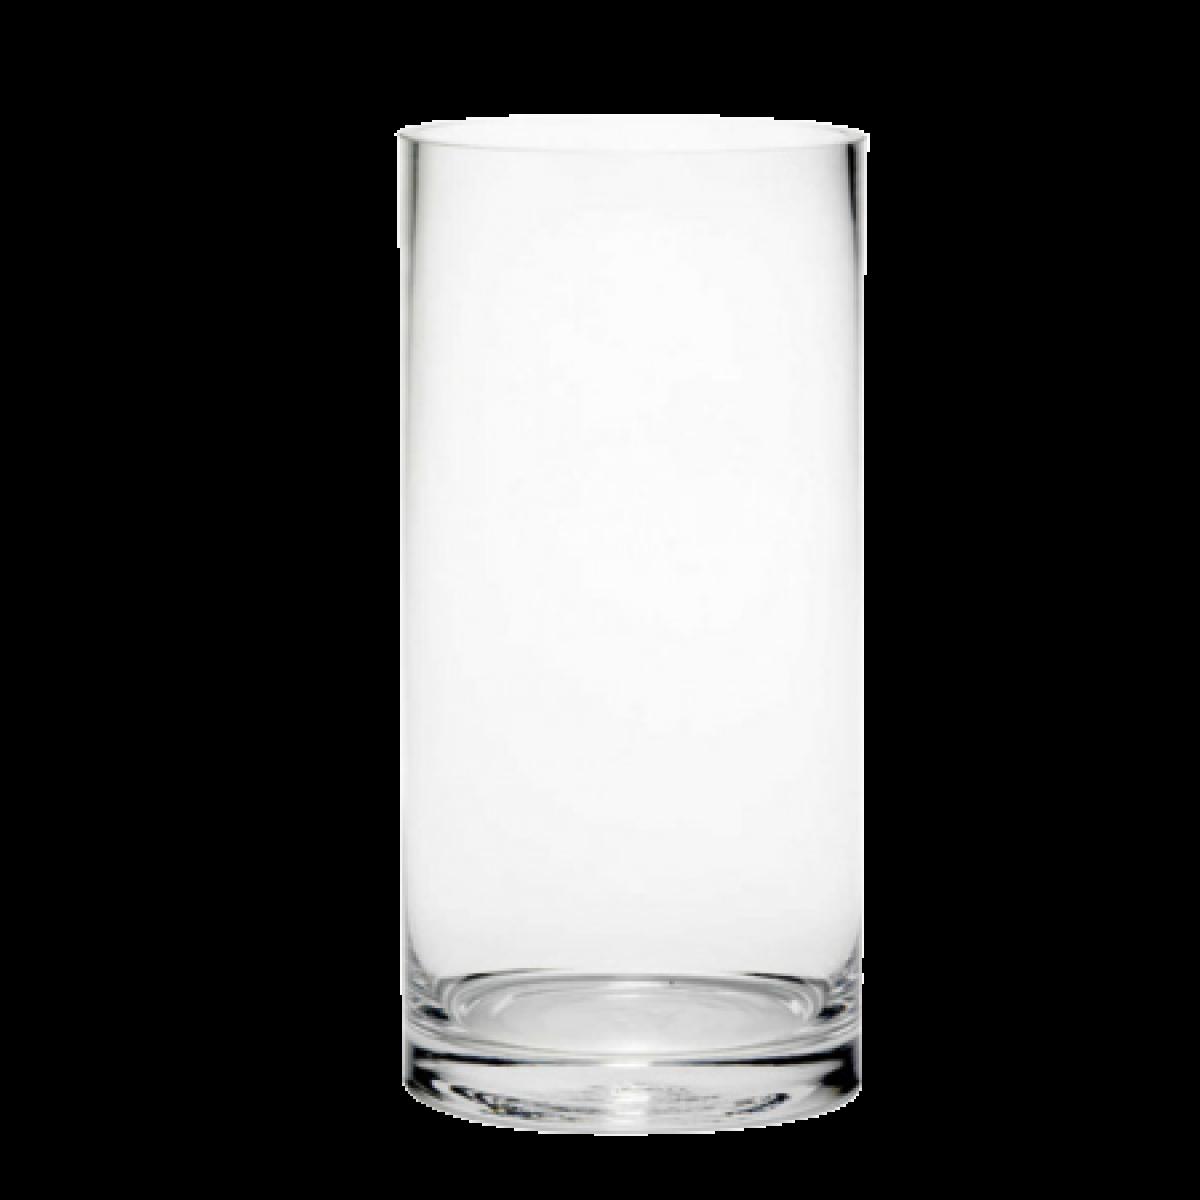 Cylinder Clear 12x25cm Acrylic Vase - 1 No